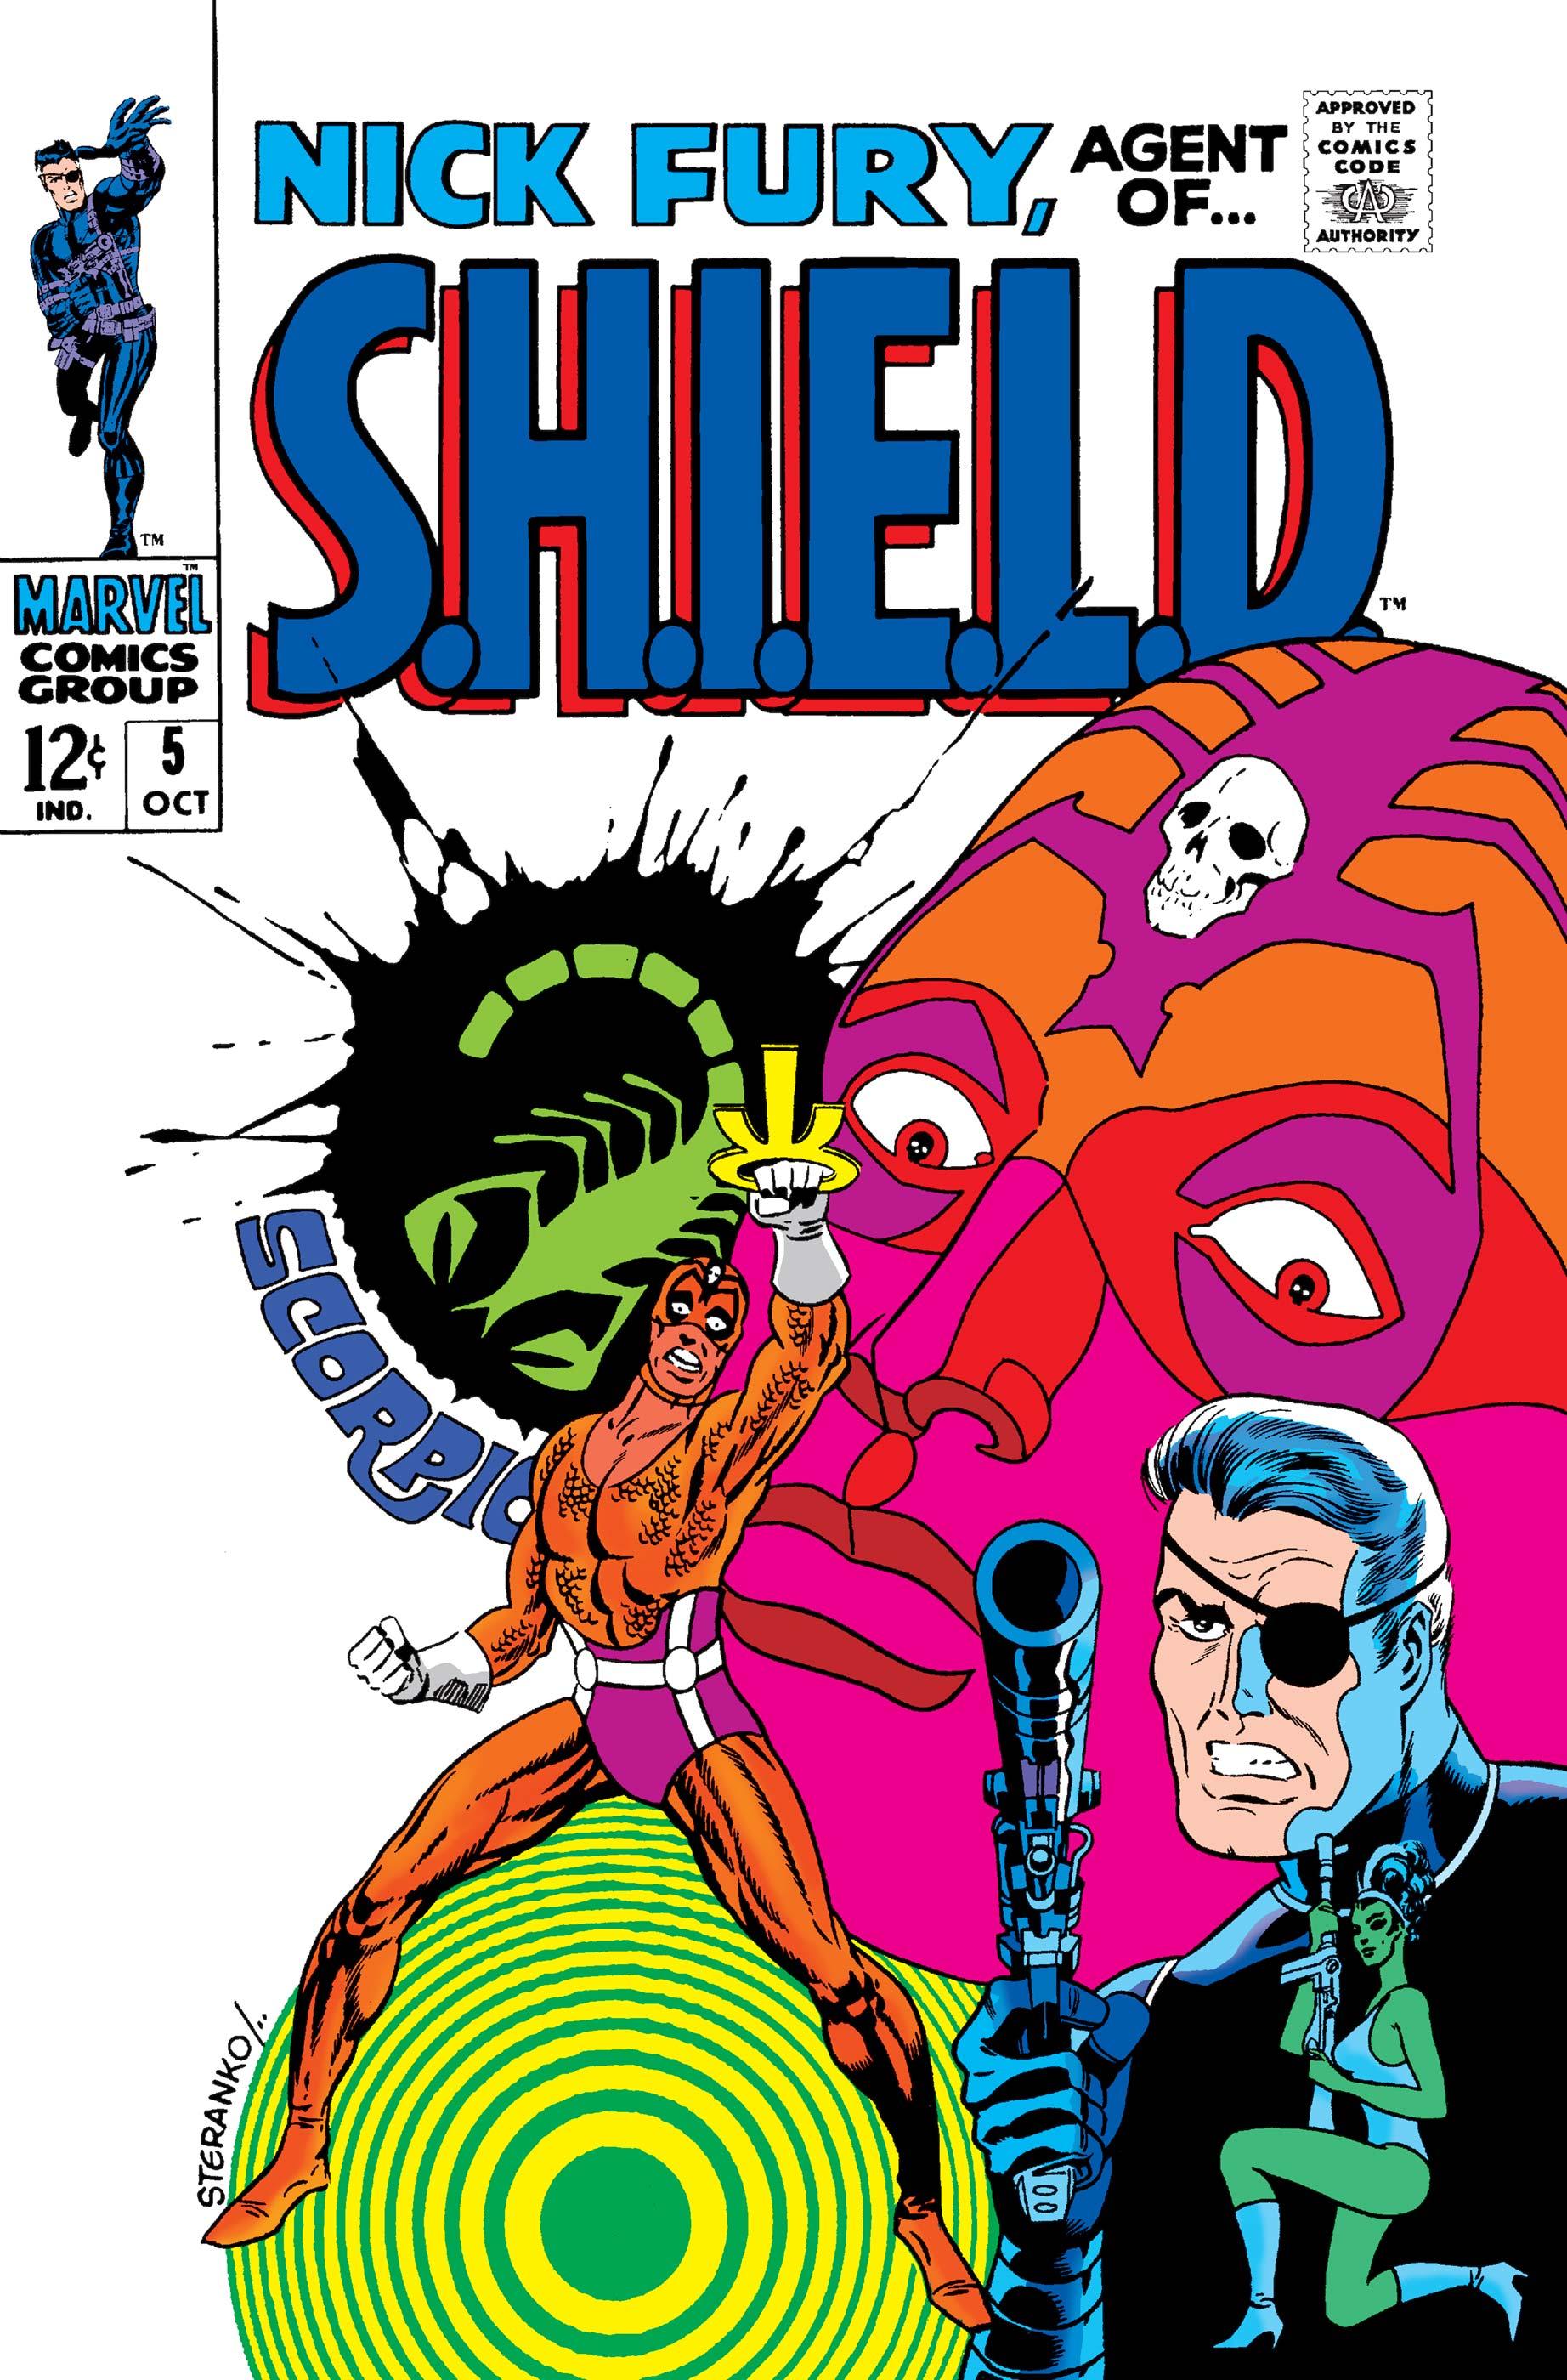 Nick Fury, Agent of S.H.I.E.L.D. (1968) #5